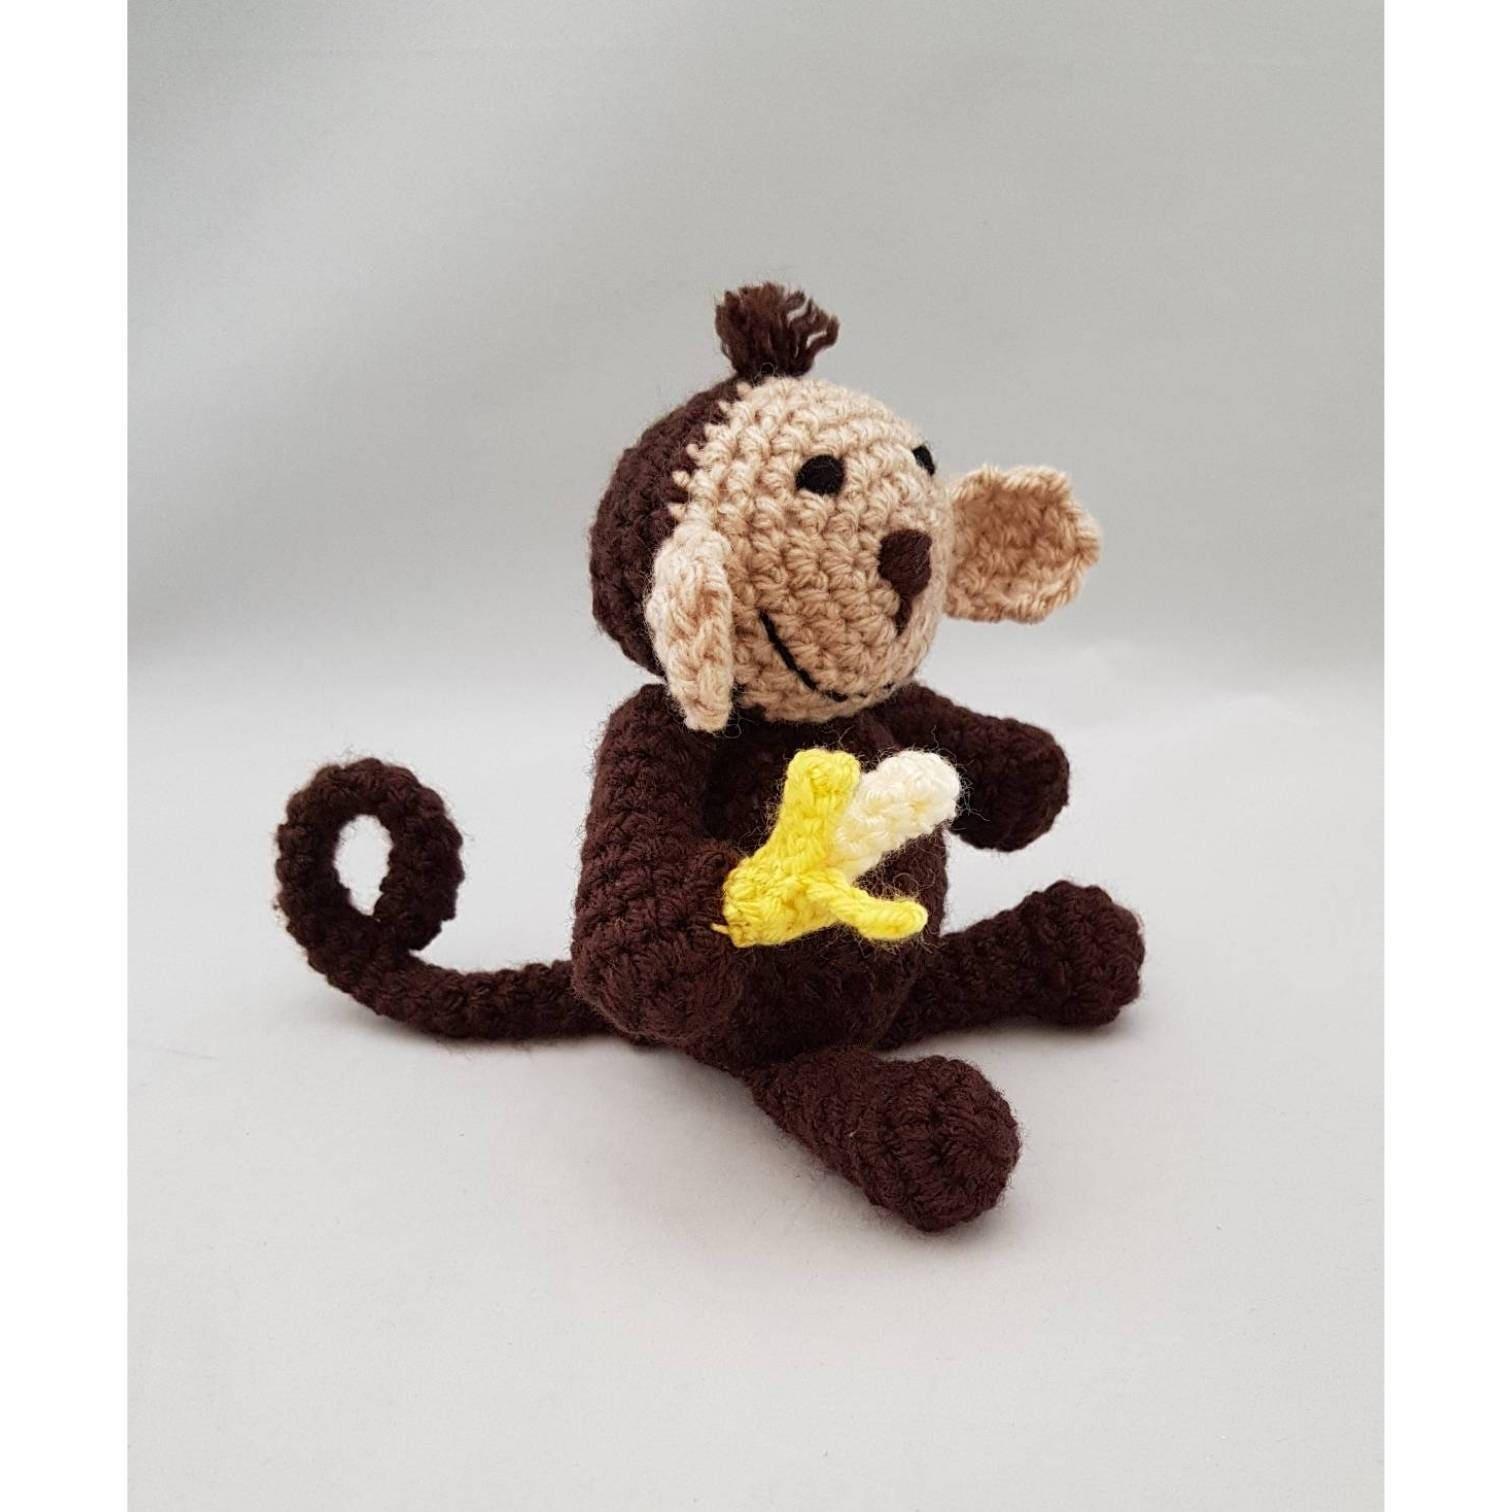 Amigurumi Crochet Toy - Monkey 8